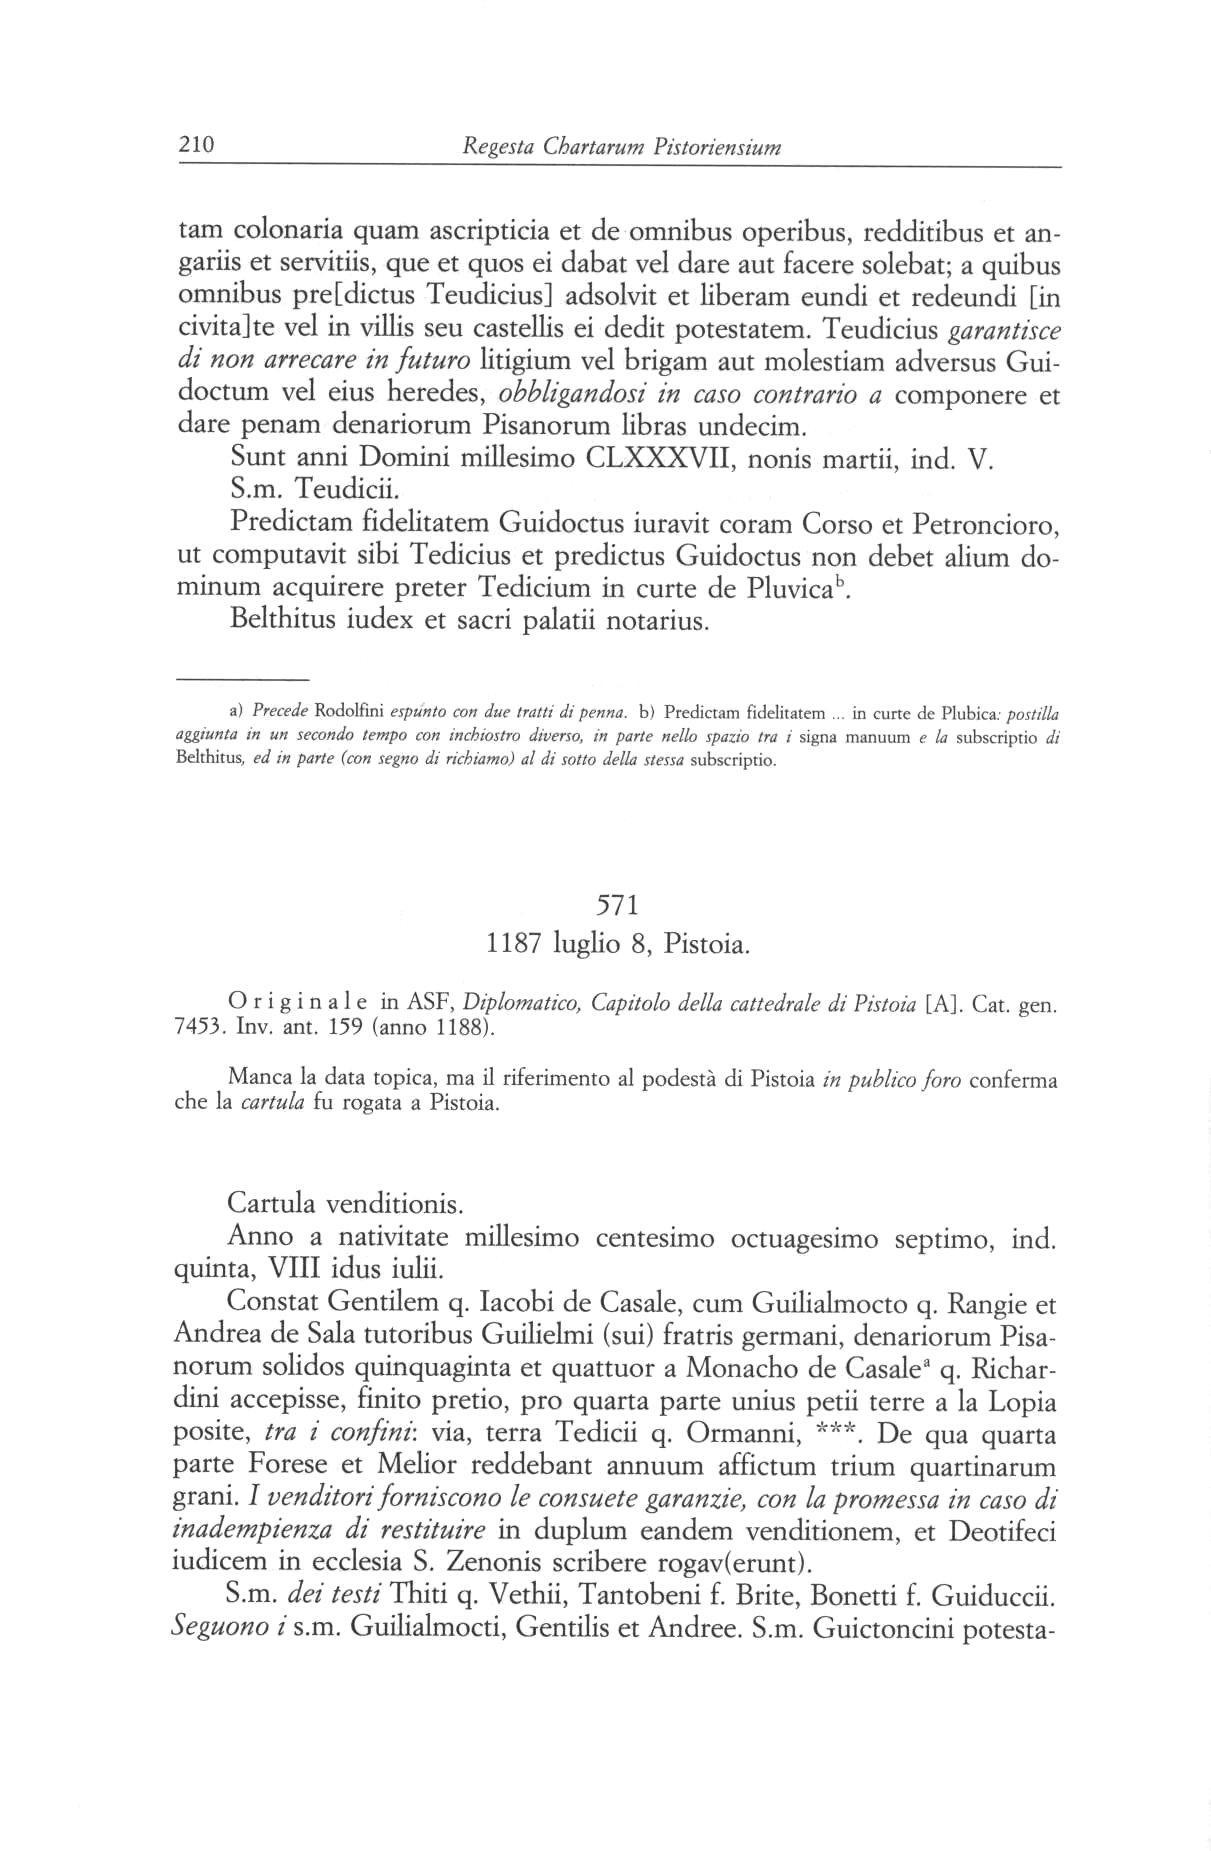 Canonica S. Zenone XII 0210.jpg